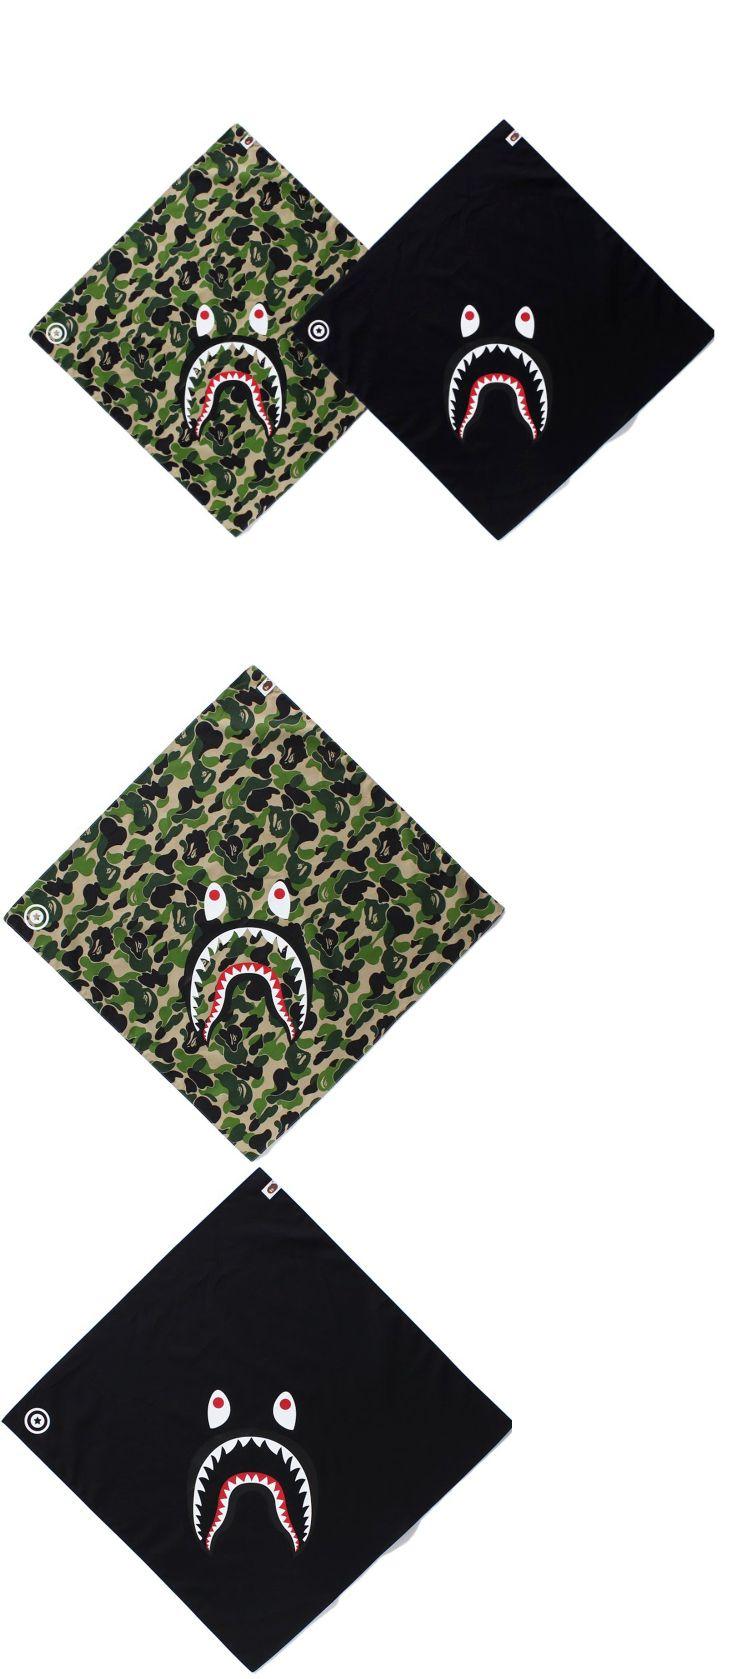 ccb8d01e1 Other Mens Accessories 1060  A Bathing Ape Bape Abc Shark Bandana Scarf  Headband Black Camo Green Mask -  BUY IT NOW ONLY   34.99 on eBay!